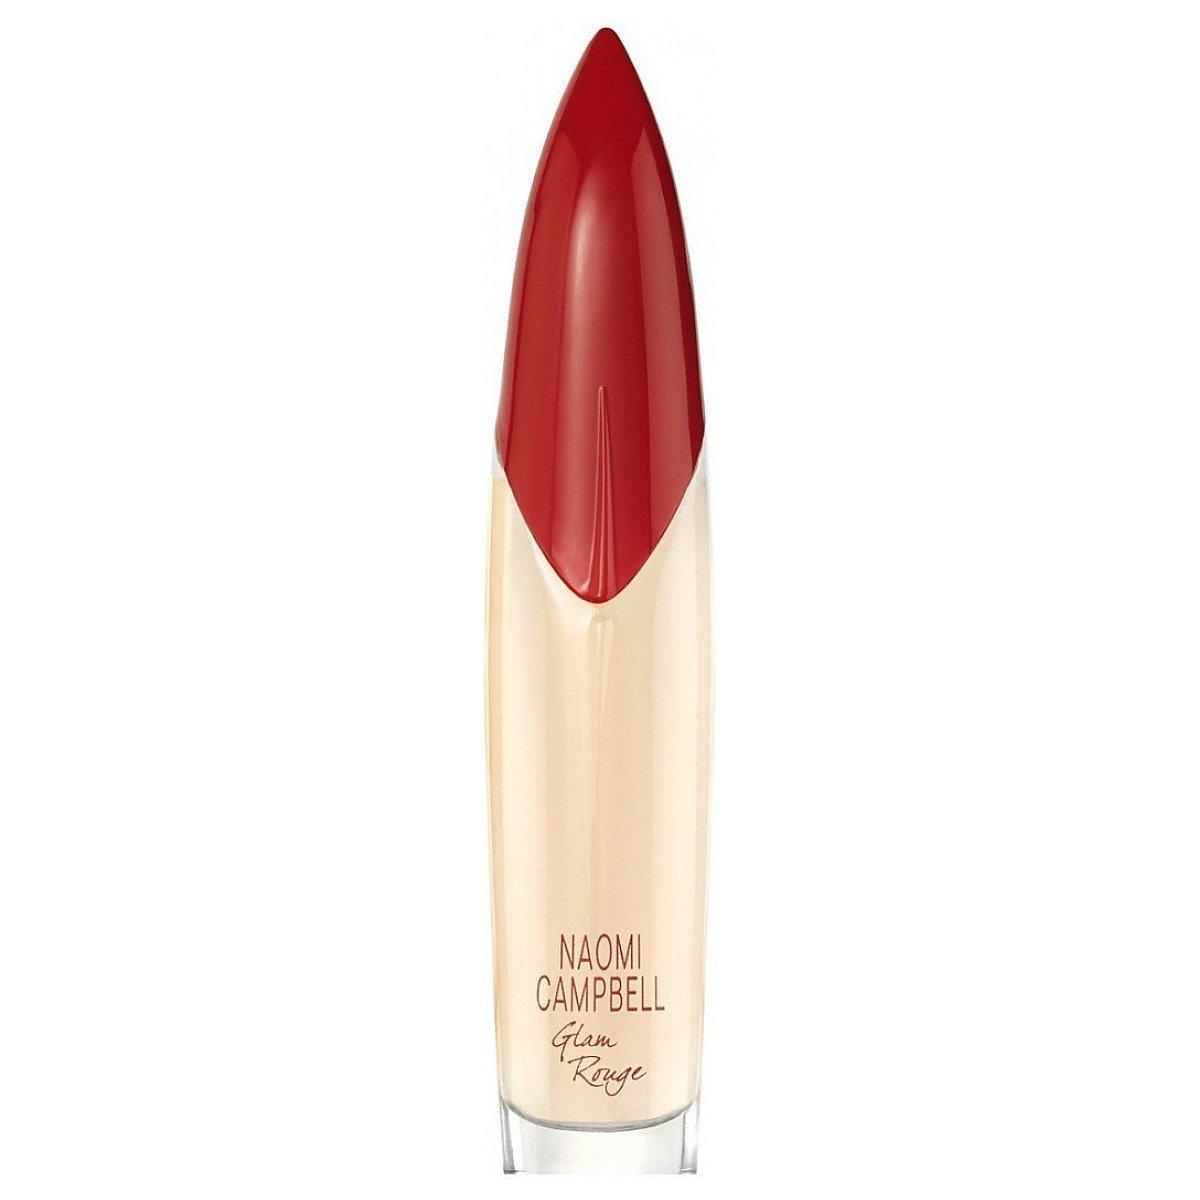 Naomi Campbell Glam Rouge Woda Toaletowa Spray 15ml